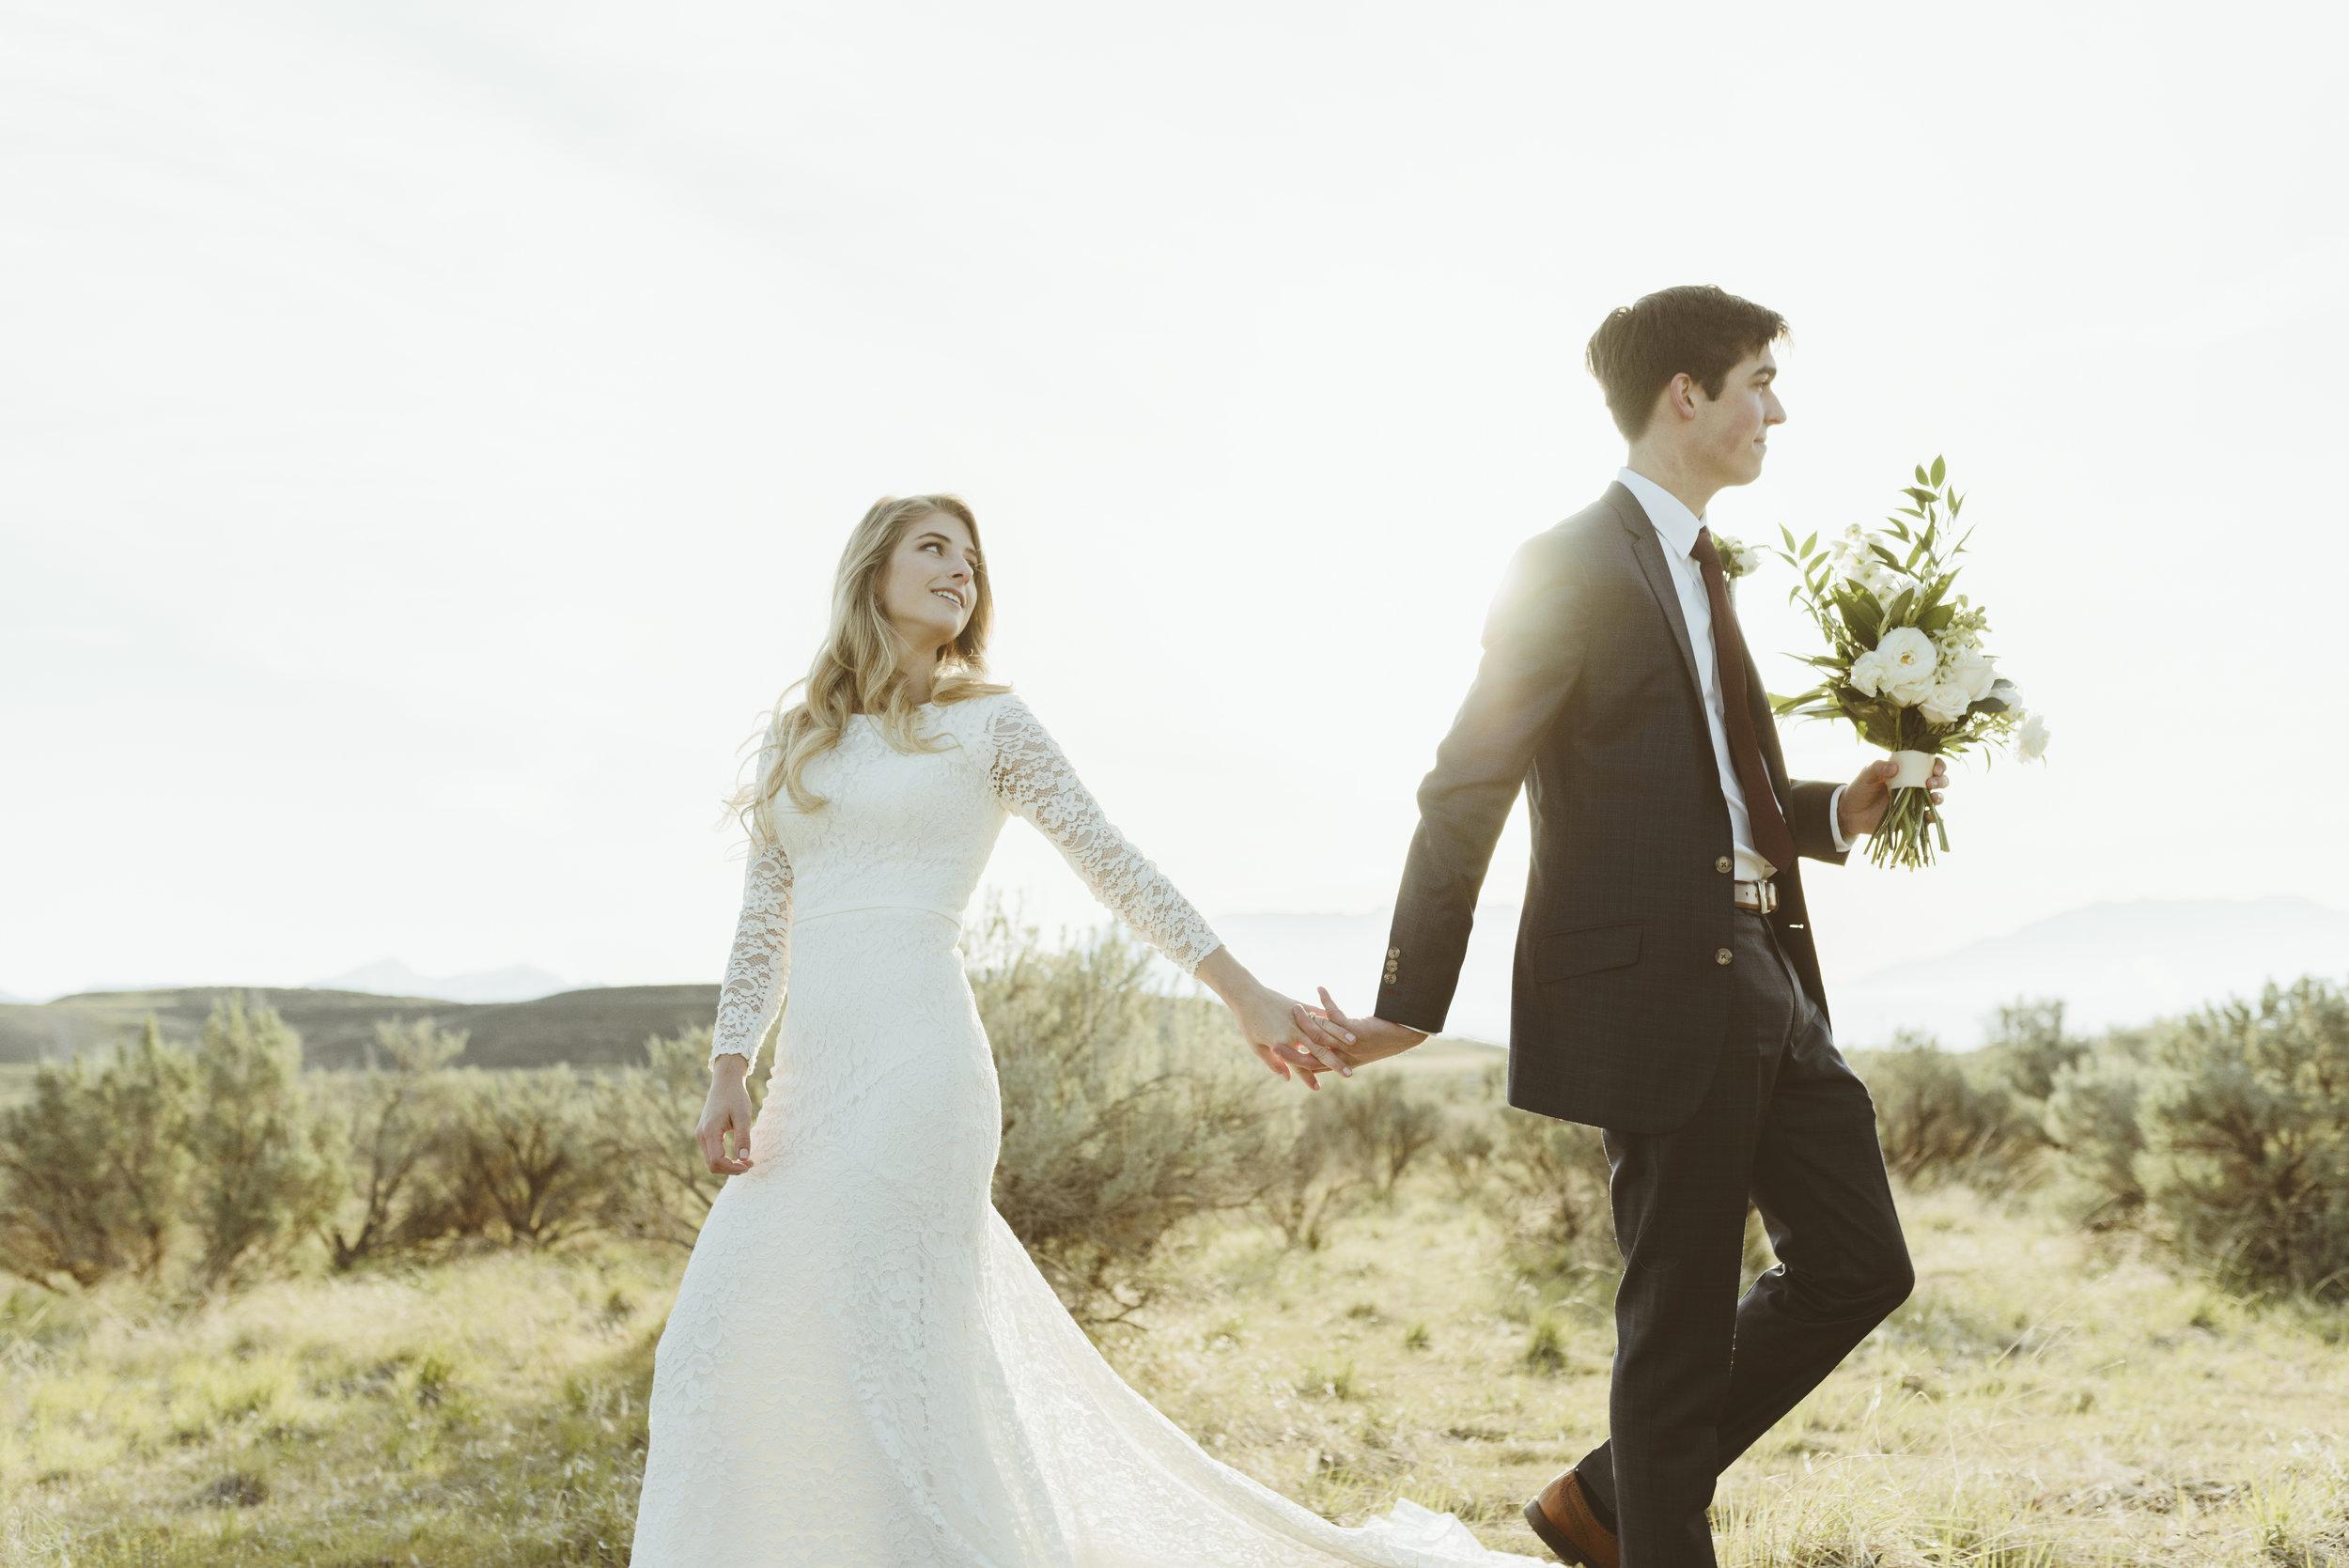 md_bridals-127.jpg